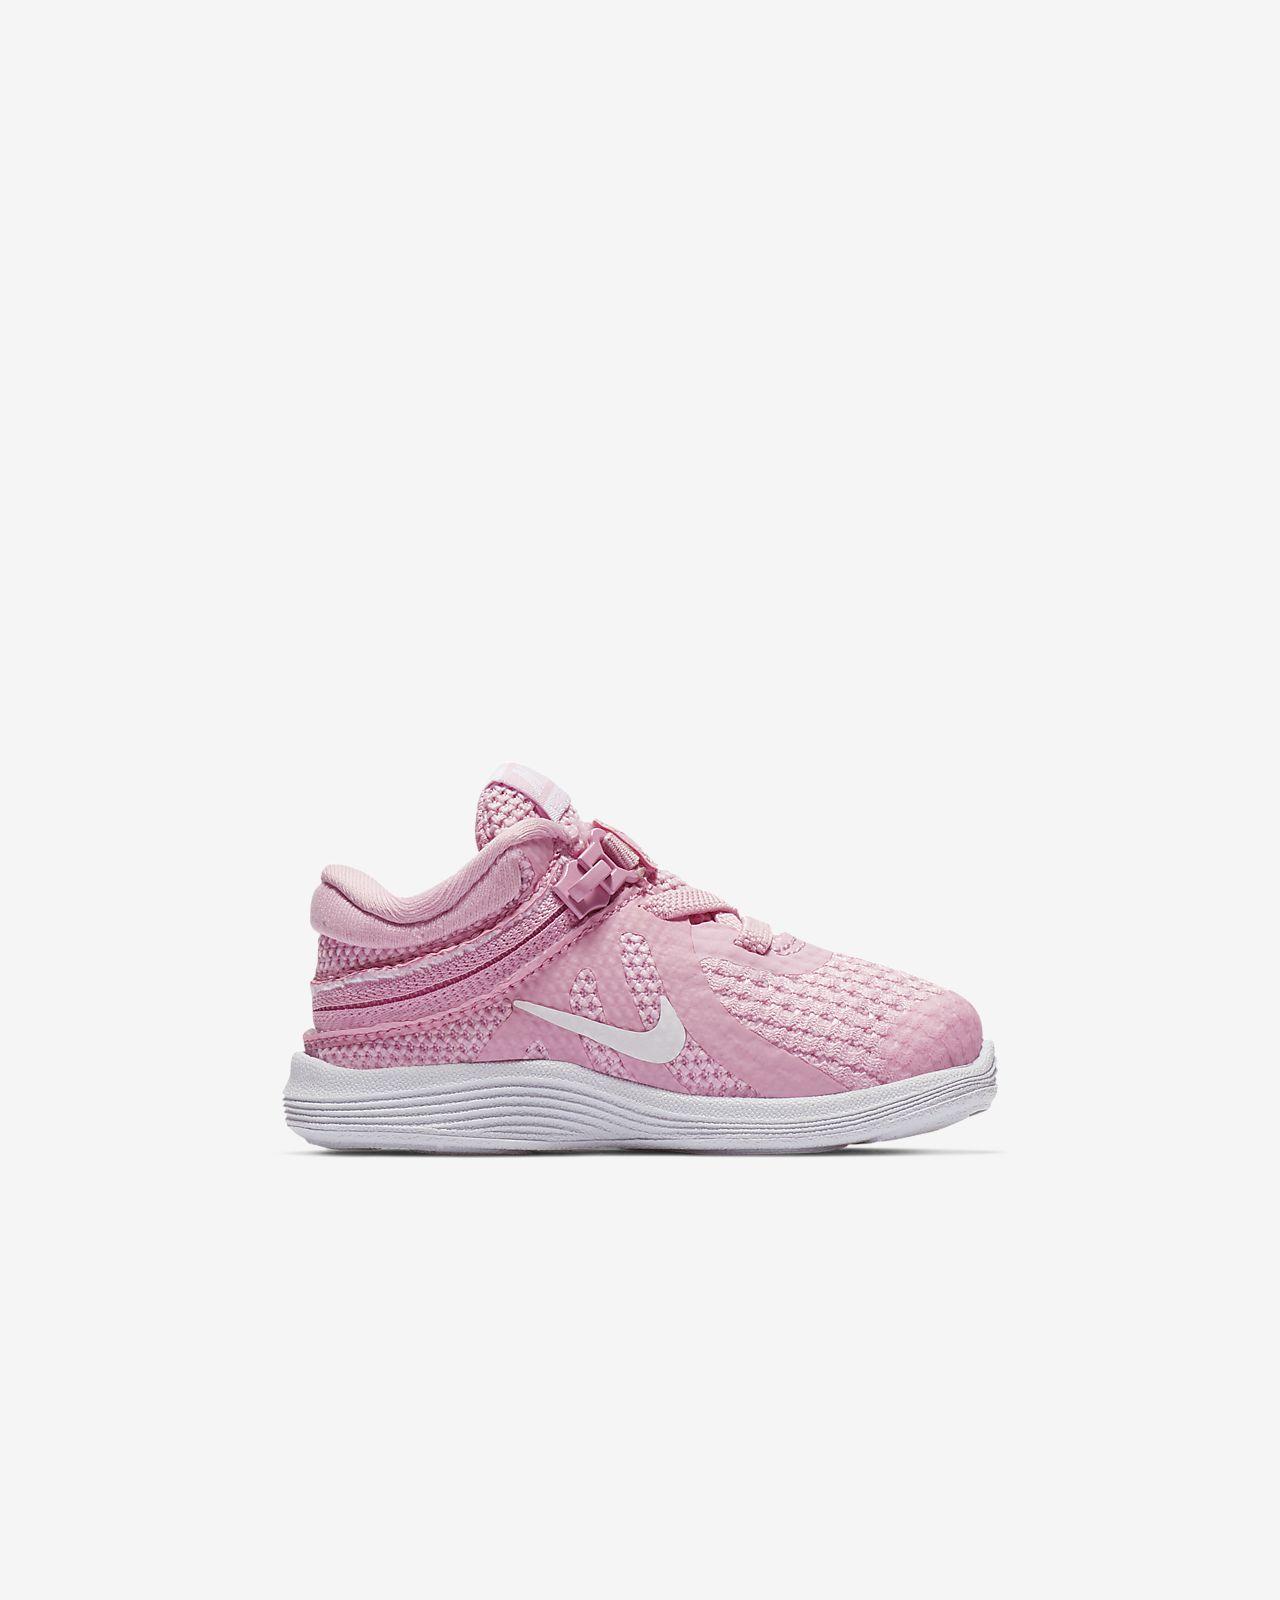 0f84b67449ed6 Nike Revolution 4 FlyEase Baby  amp  Toddler Shoe. Nike.com AU